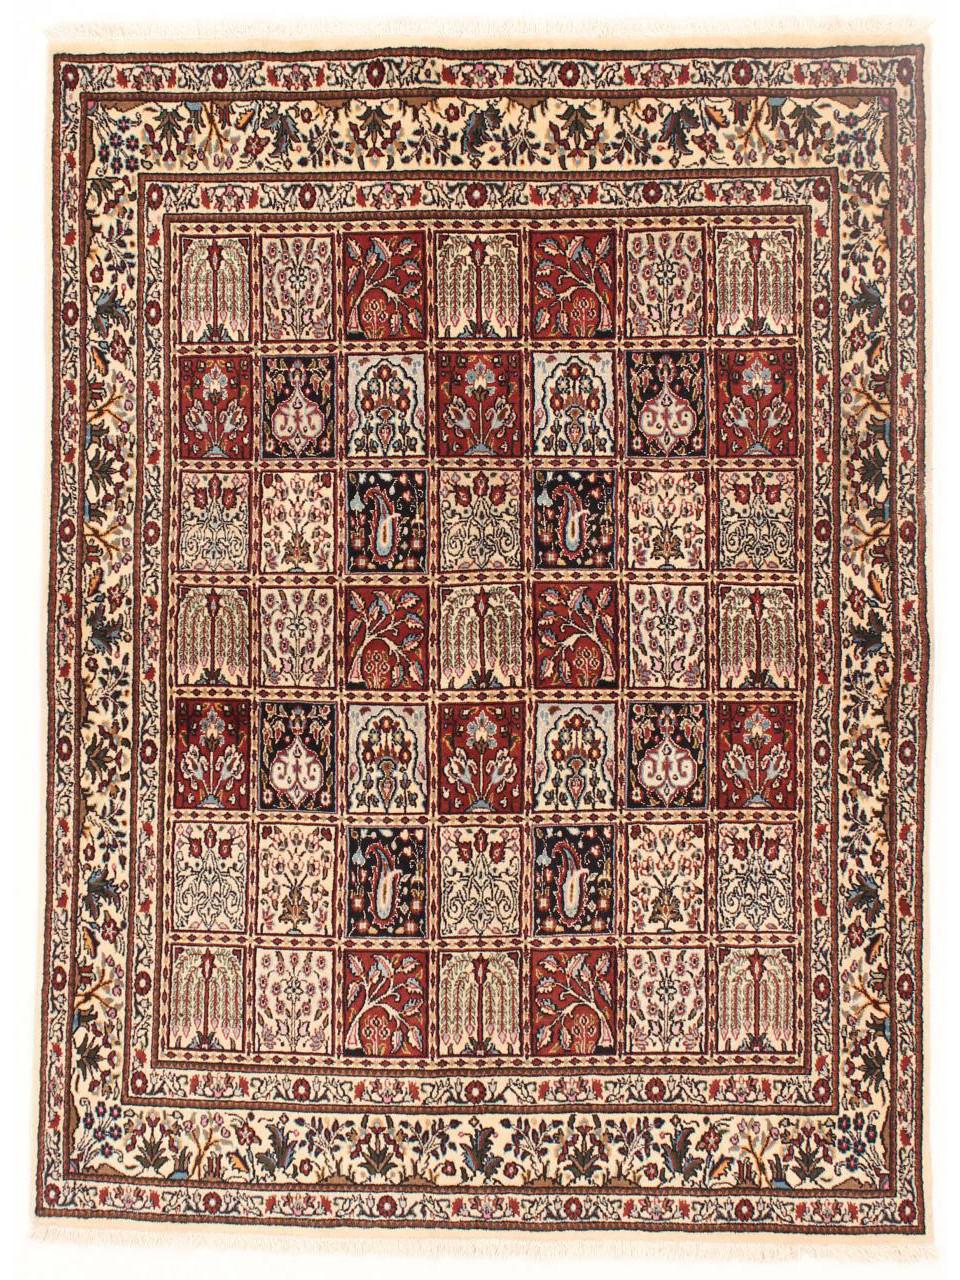 moud jardin tapis persans n 26436 193x143cm. Black Bedroom Furniture Sets. Home Design Ideas